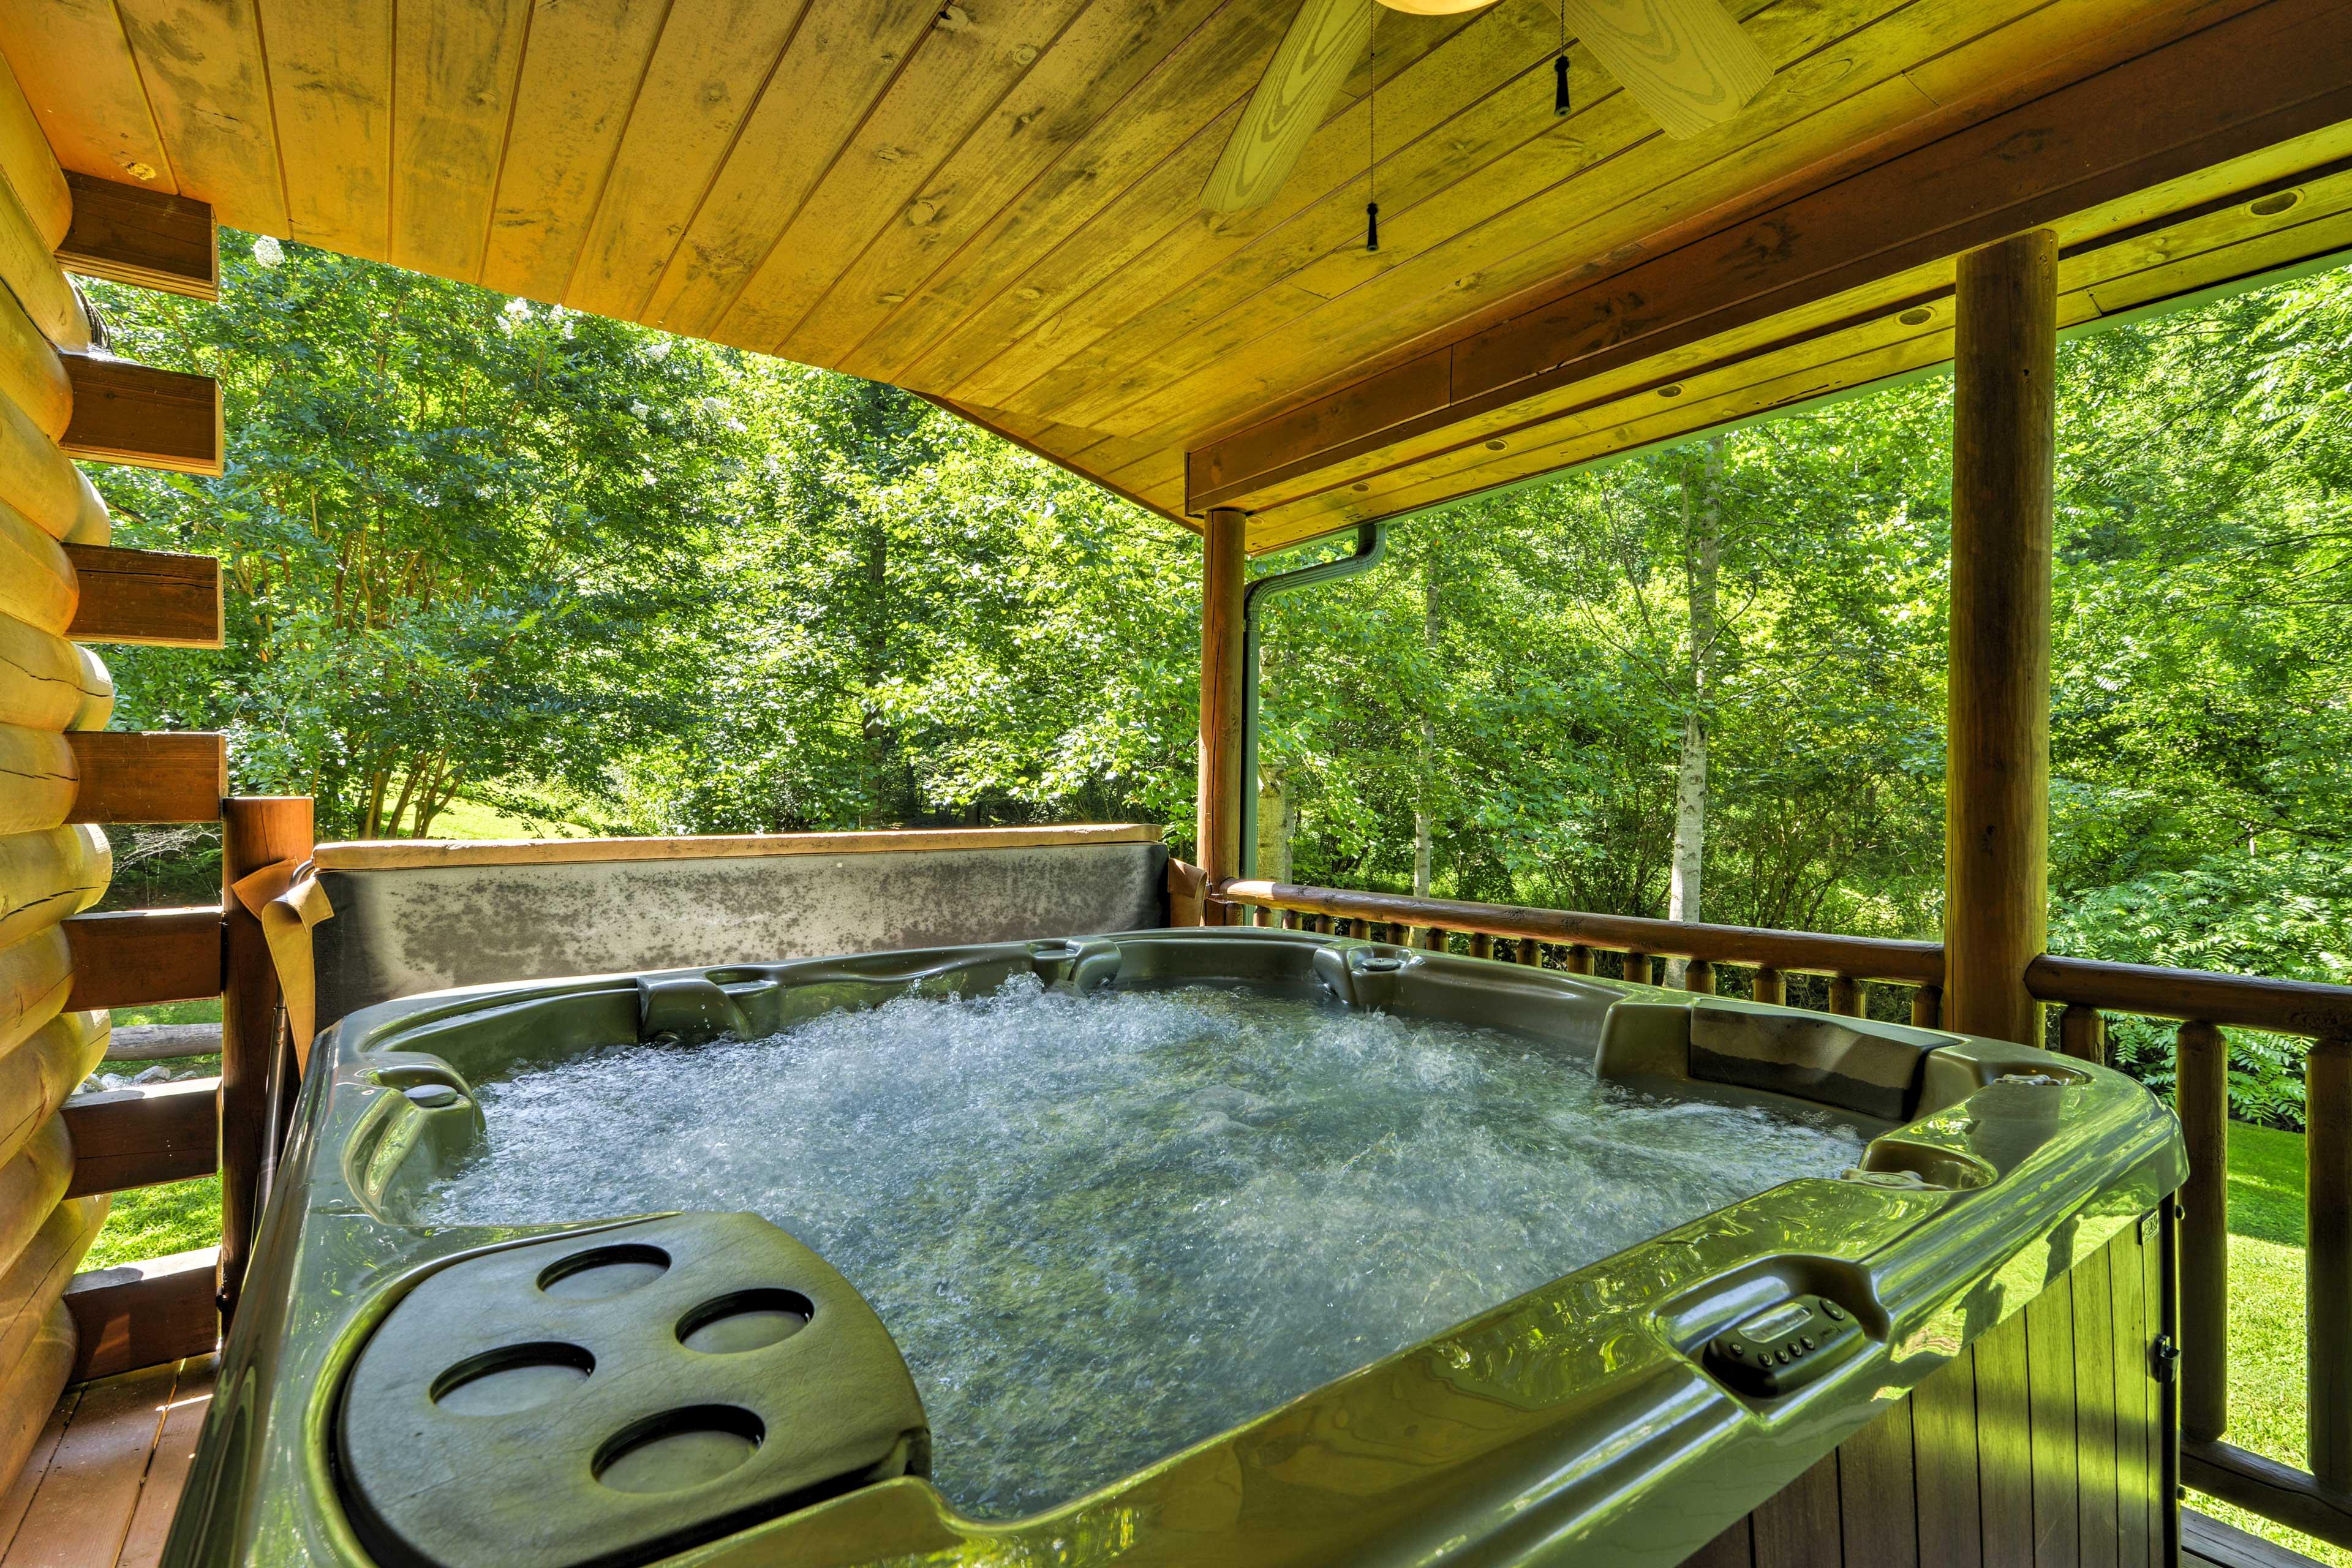 Soak your worries away in the hot tub.